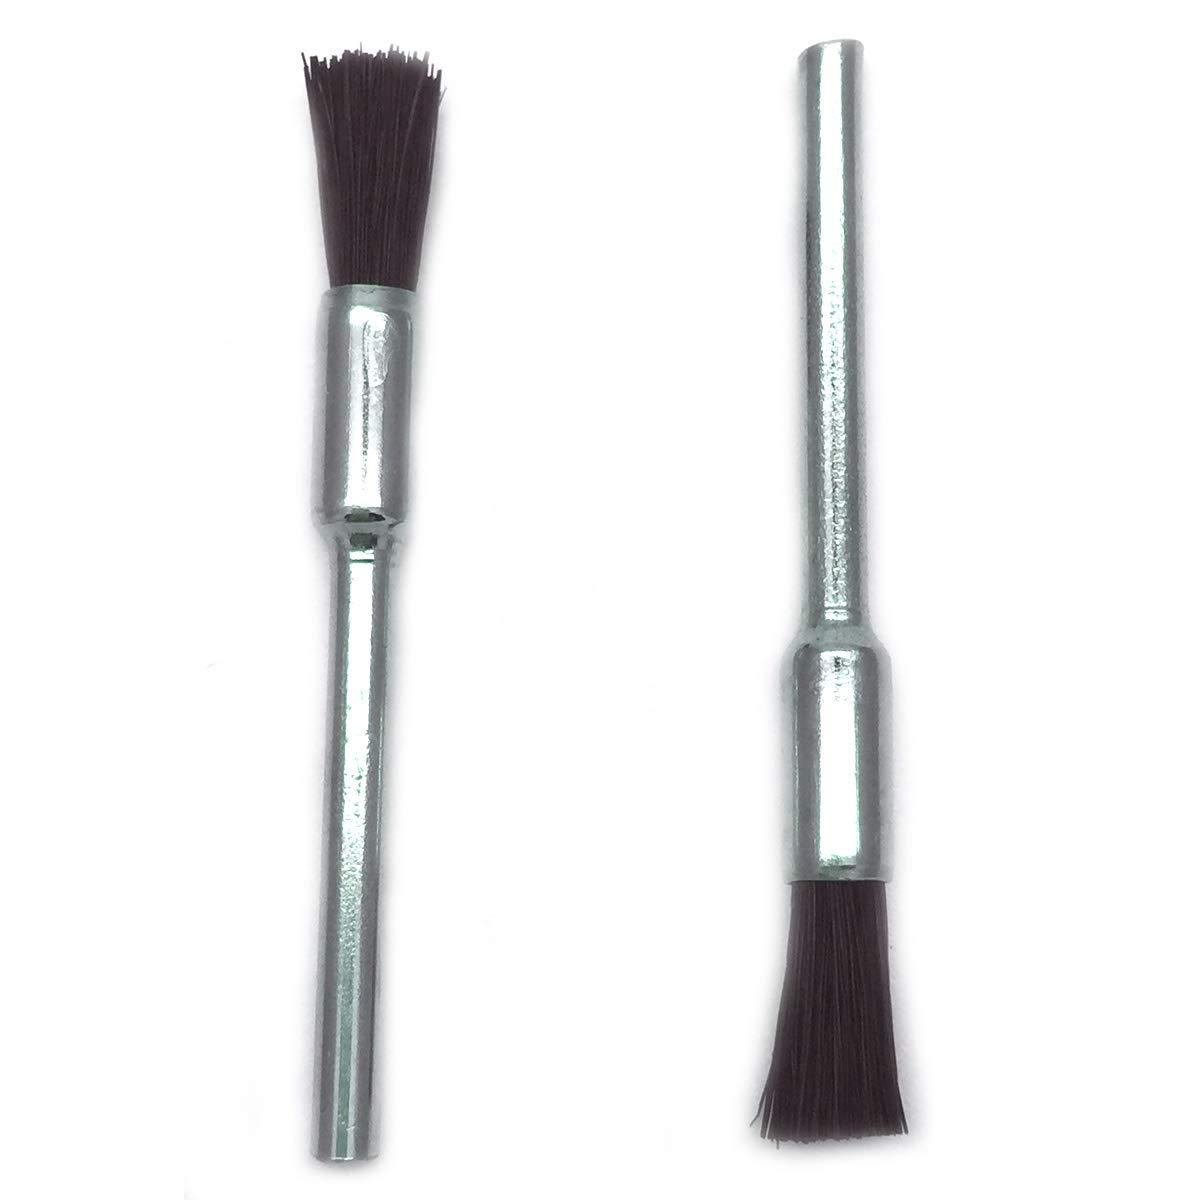 COMOK Nylon Bristle Brushes Black Pen Shape Cleaning Brushes 1//8 Shank Fit Dremel Diamond Walnut Bodhi Jade Silverware Polishing 40PCS